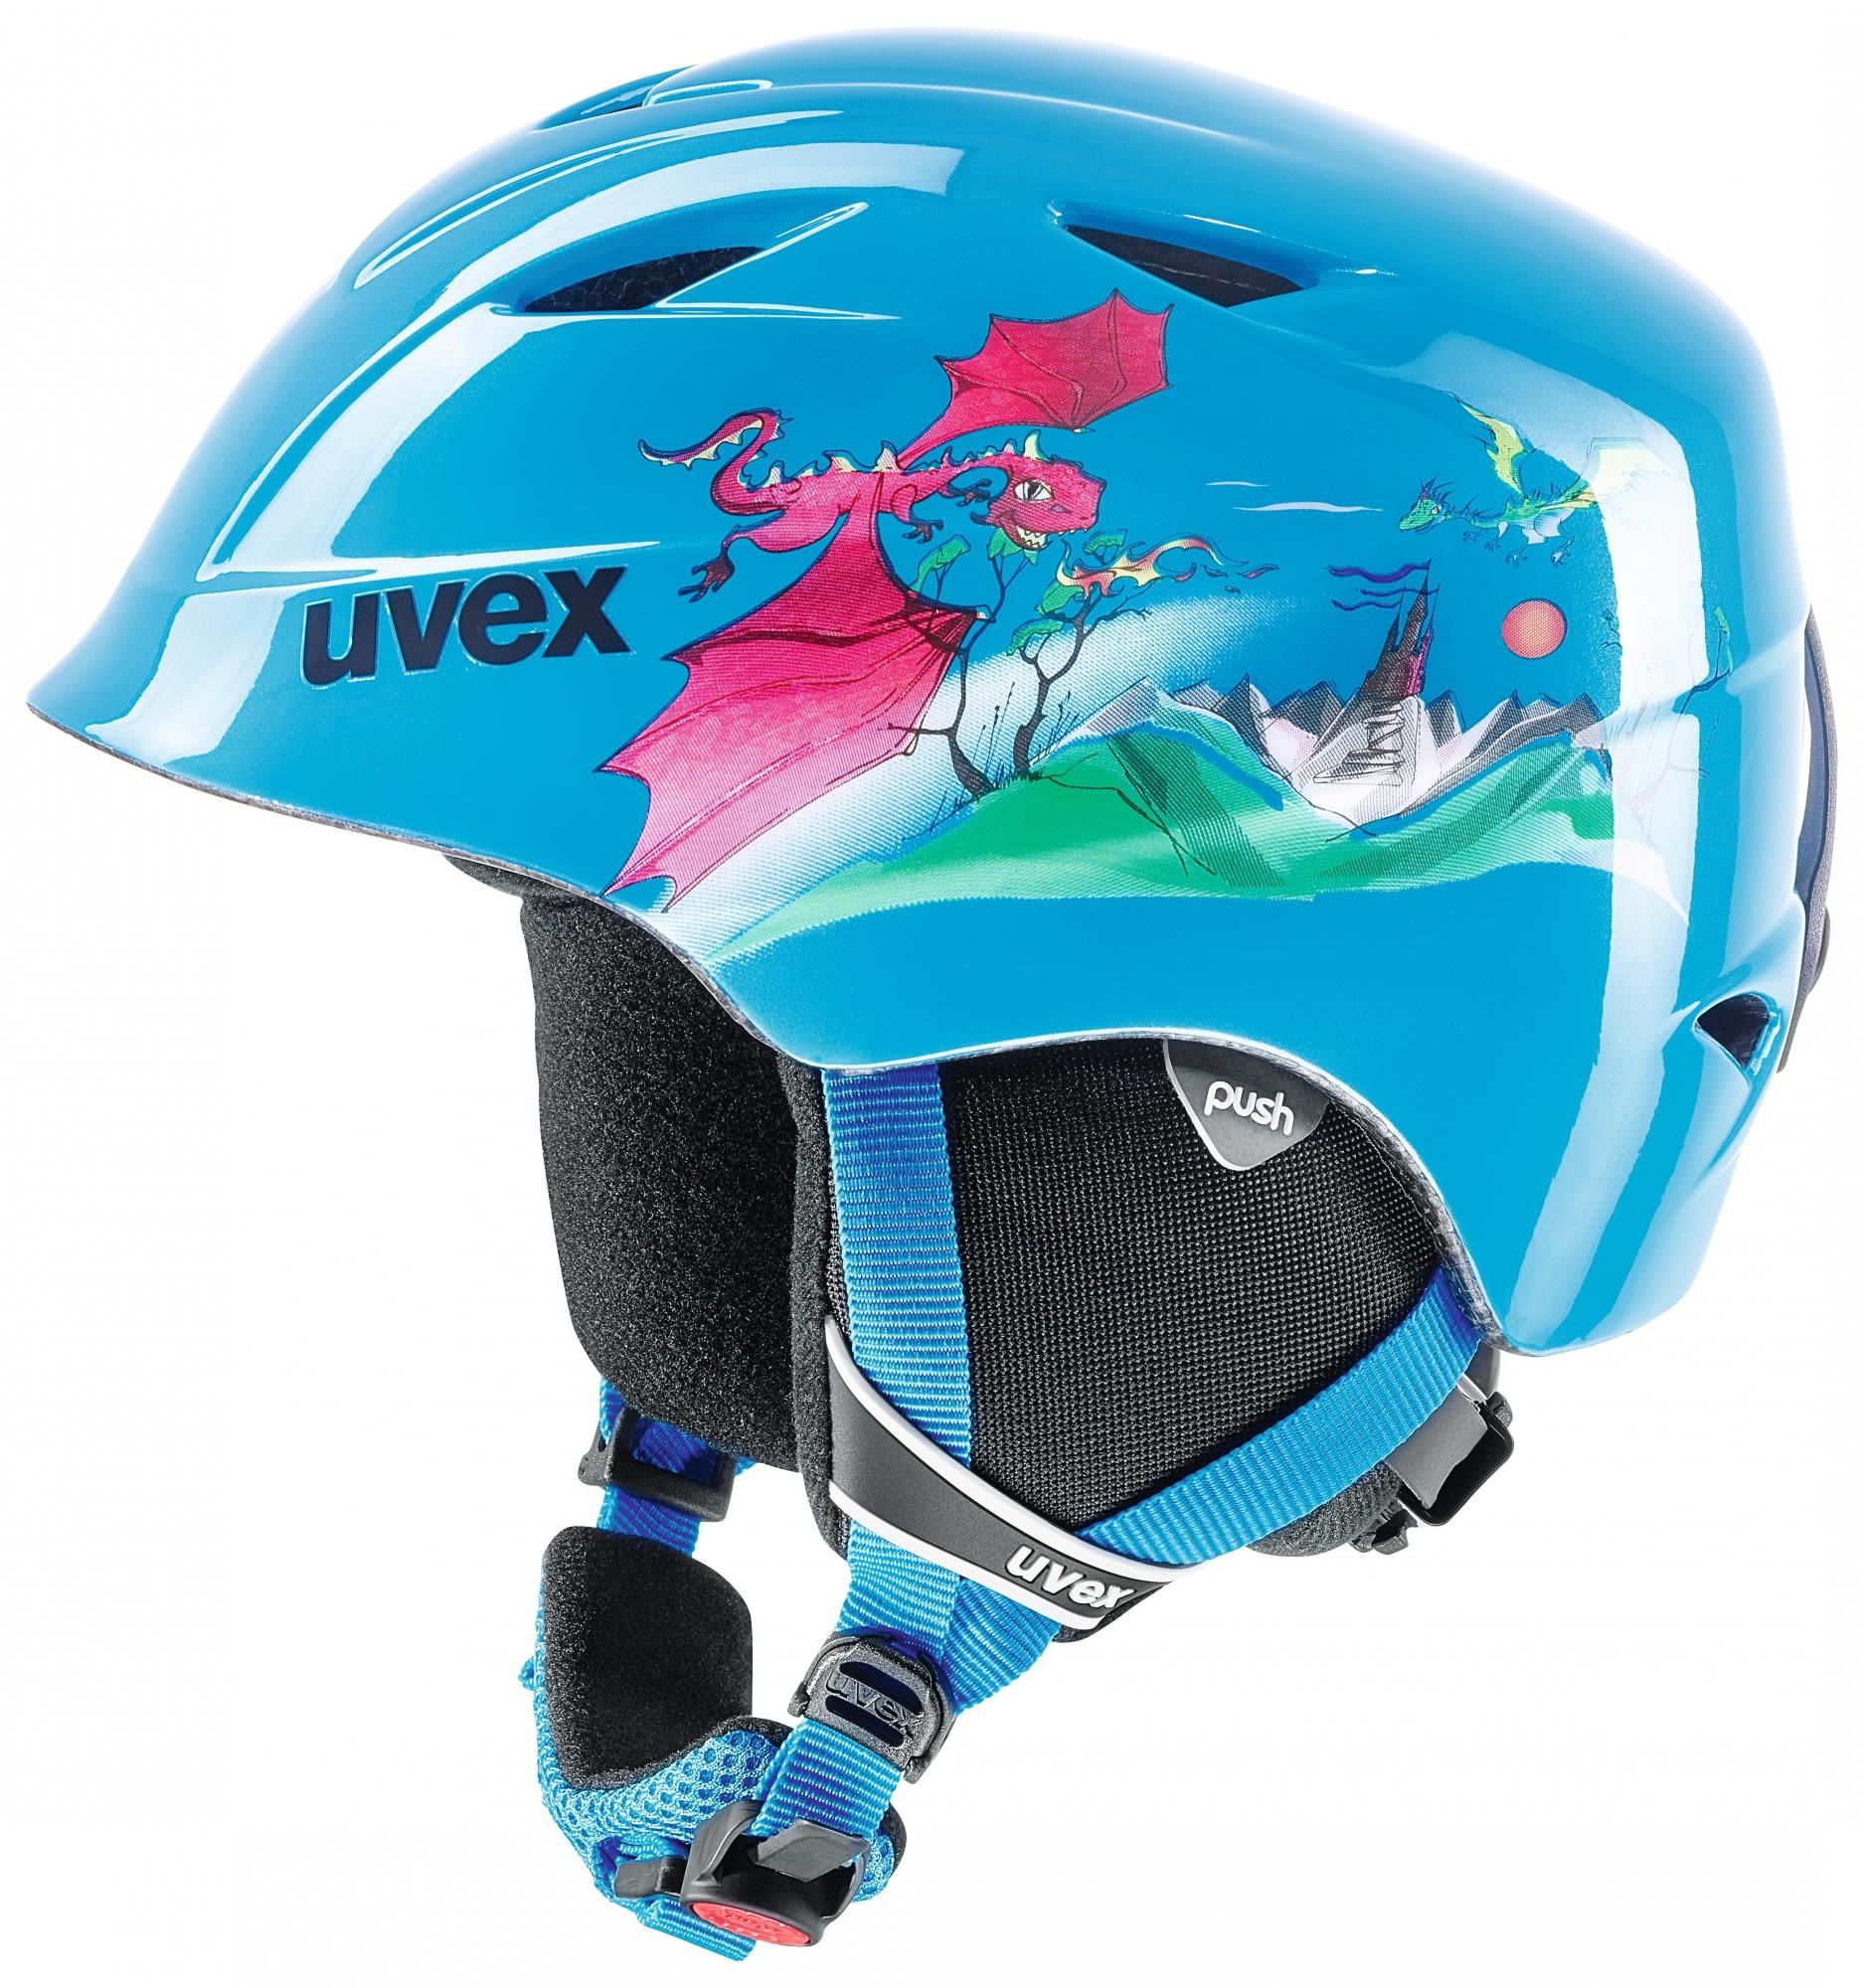 Uvex Kids Airwing 2 Blau, Ski-& Snowboardhelm, 48 -52 cm